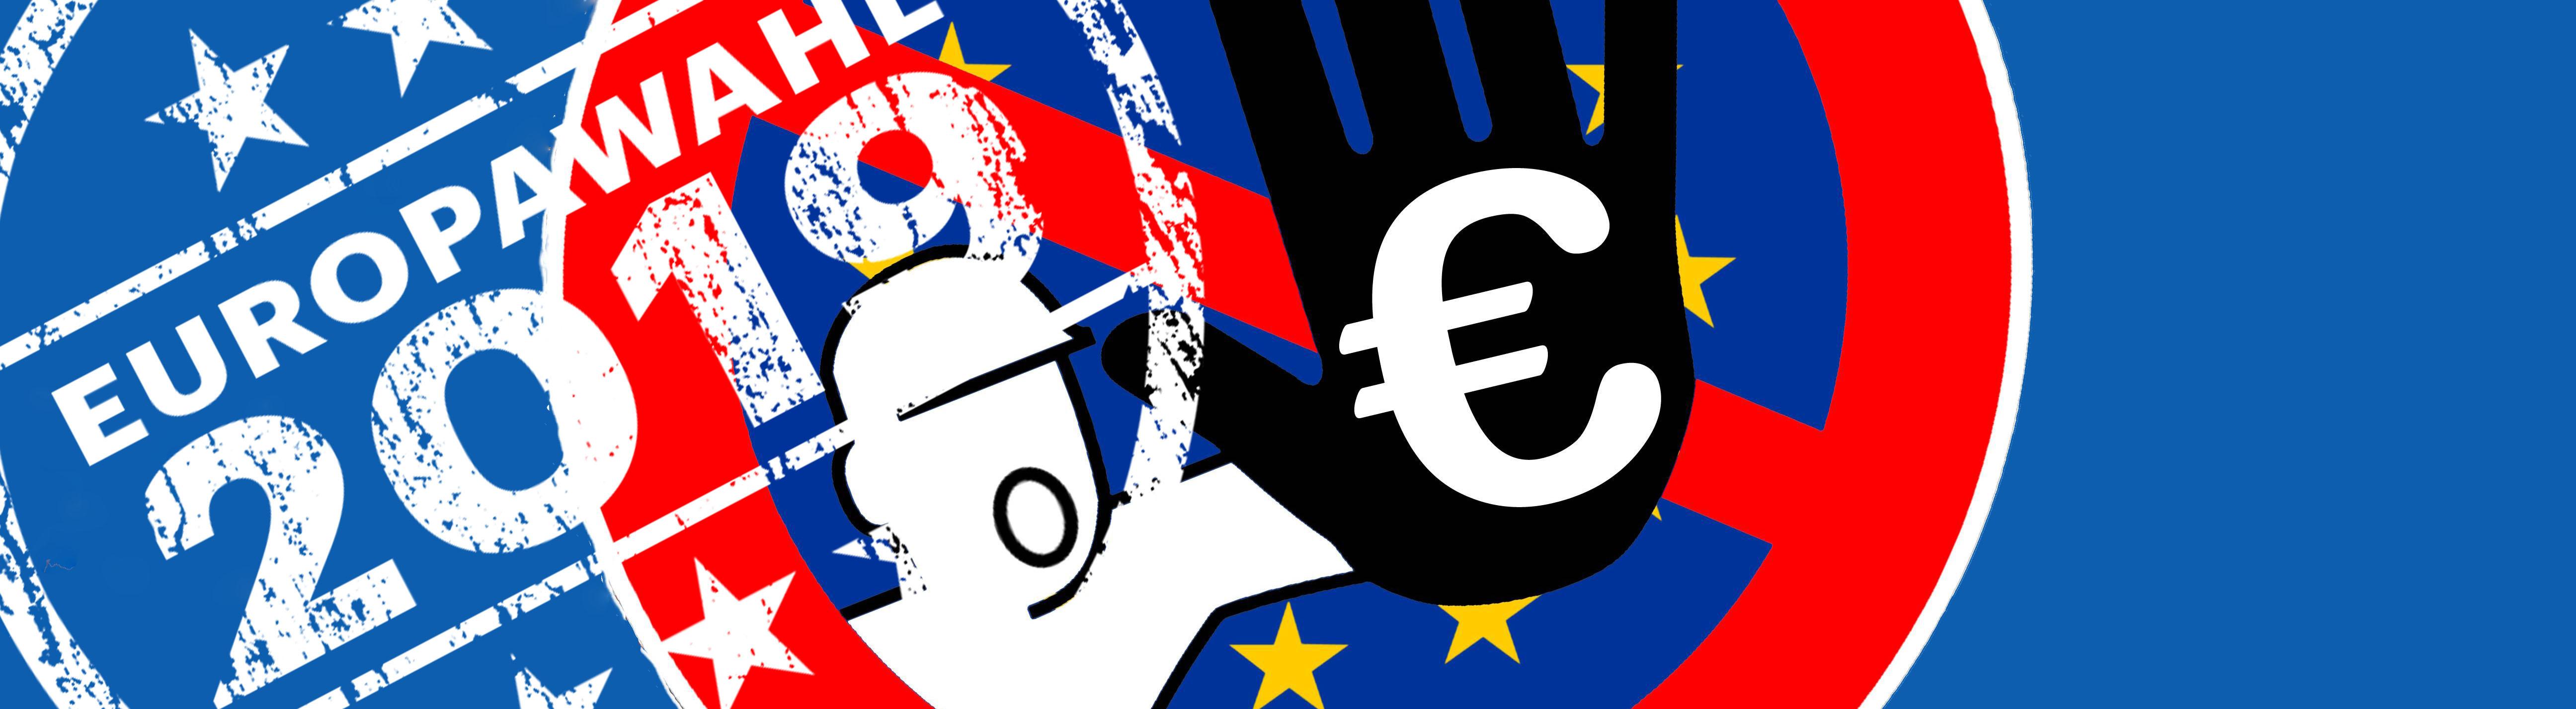 EU Europäische Union Euro-Zone Europawahl 2019